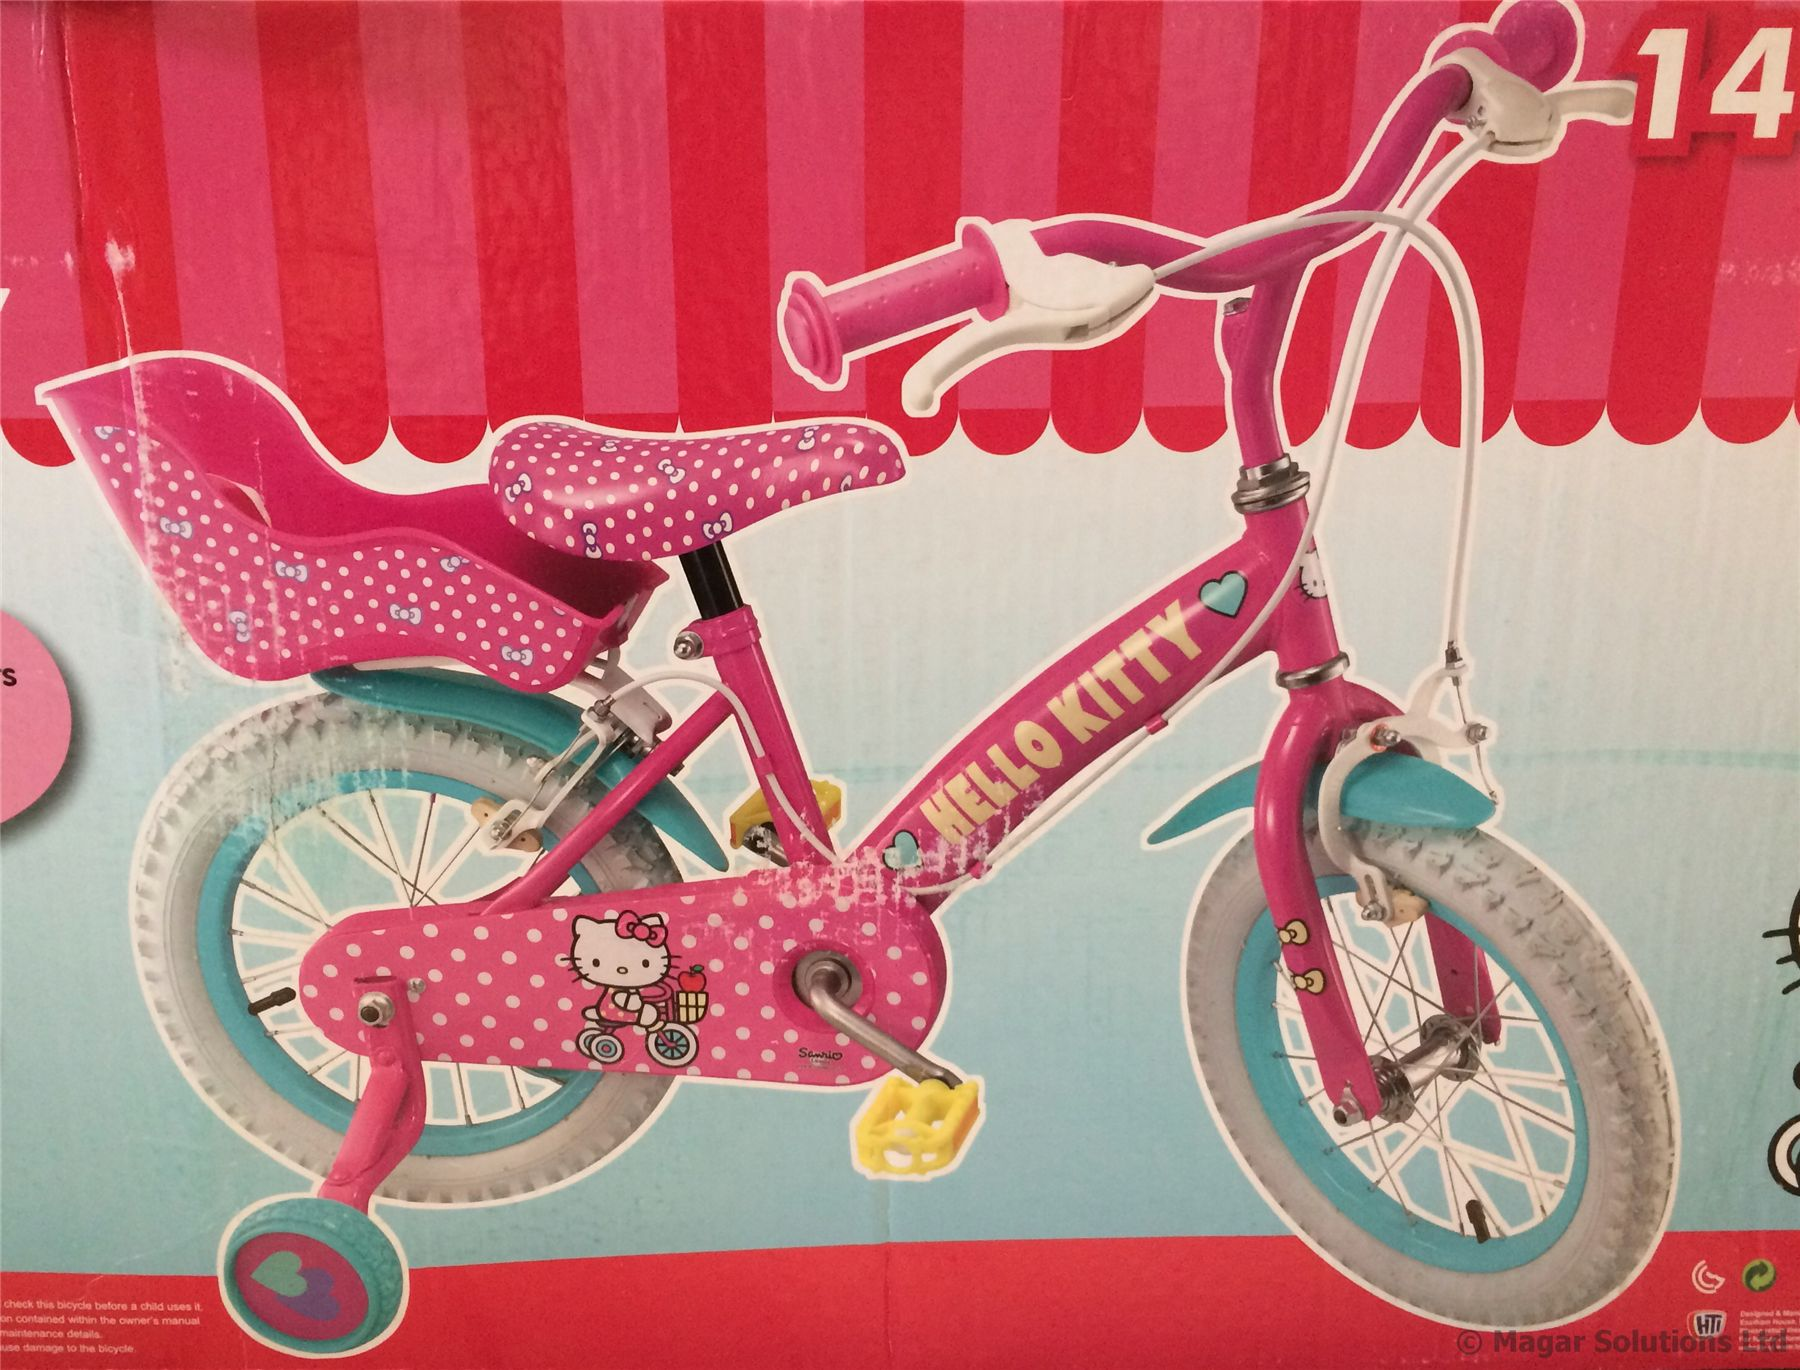 Hello-Kitty-14-Girls-Bike-Pink-Bicycle-Dolls-Seat-Stabilisers-Age-4